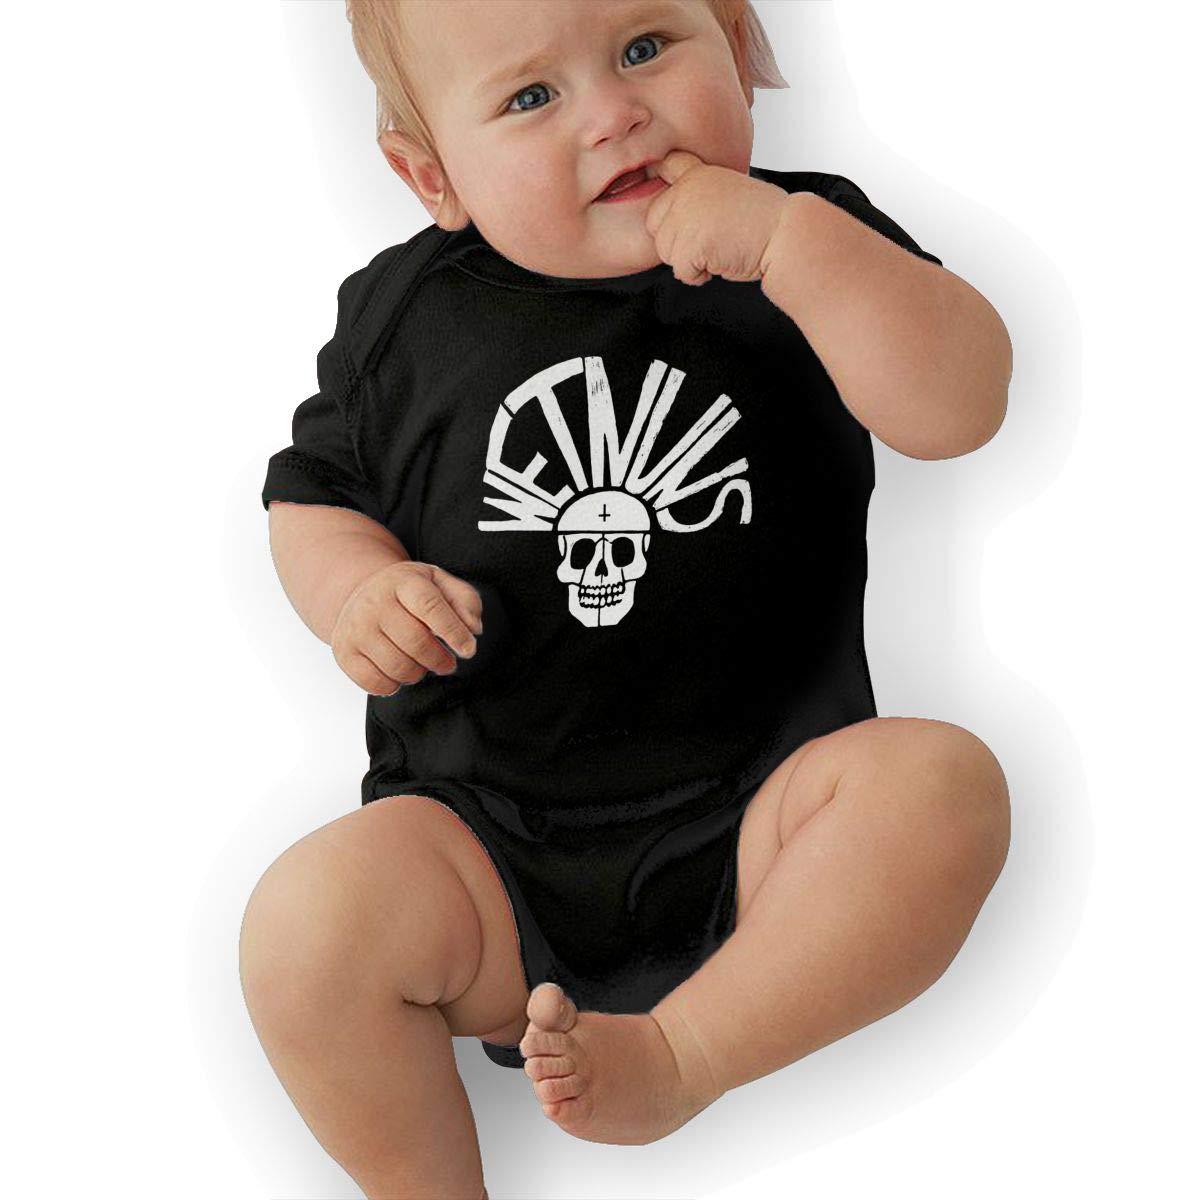 LuckyTagy Arctic Monkeys Unisex Funny Toddler Romper Baby GirlOutfits Black